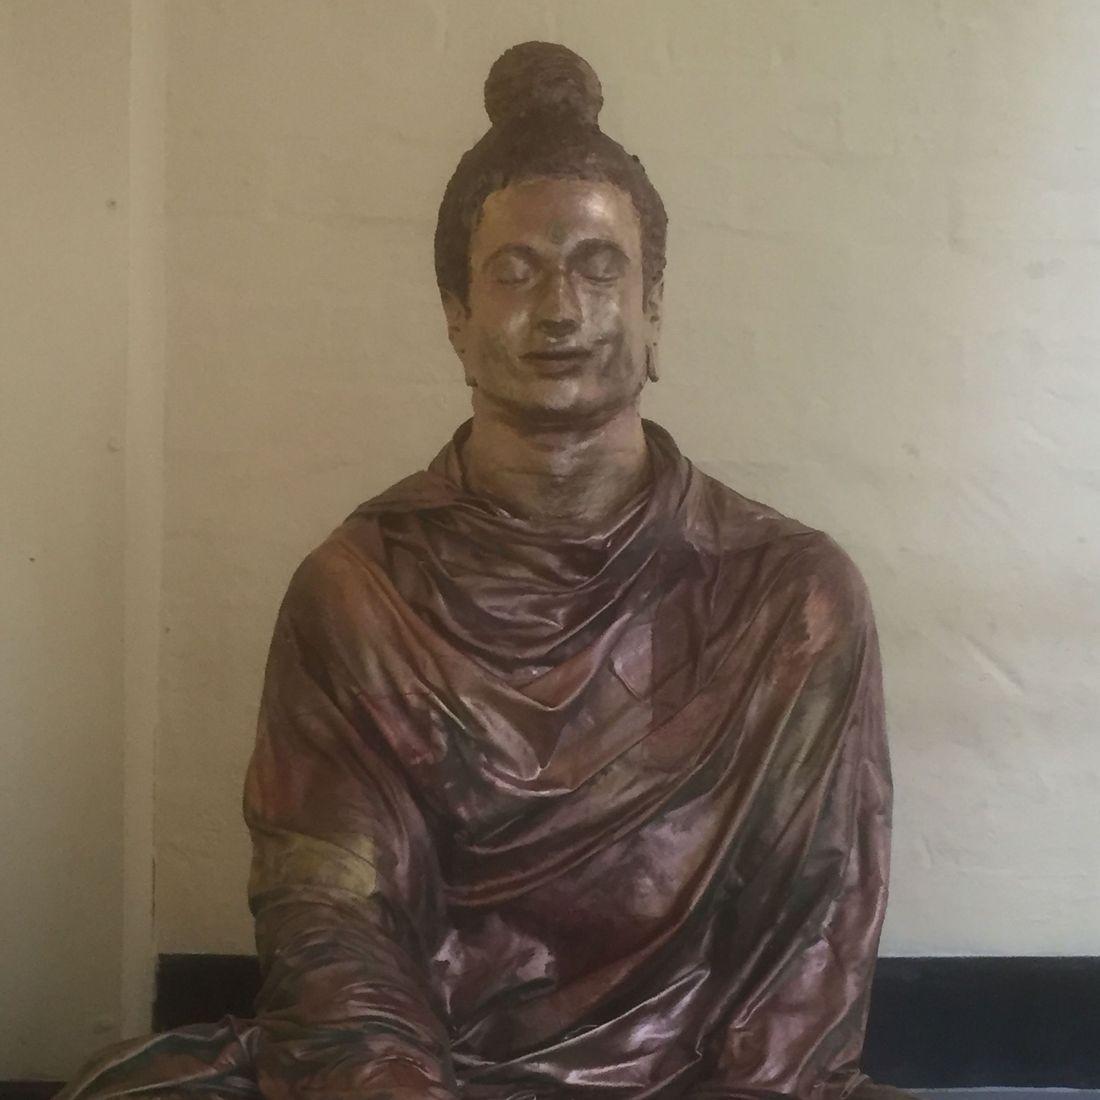 Earthmoves Buddha rupa statue Liverpool Buddhist sacred sculpture Shakyamuni